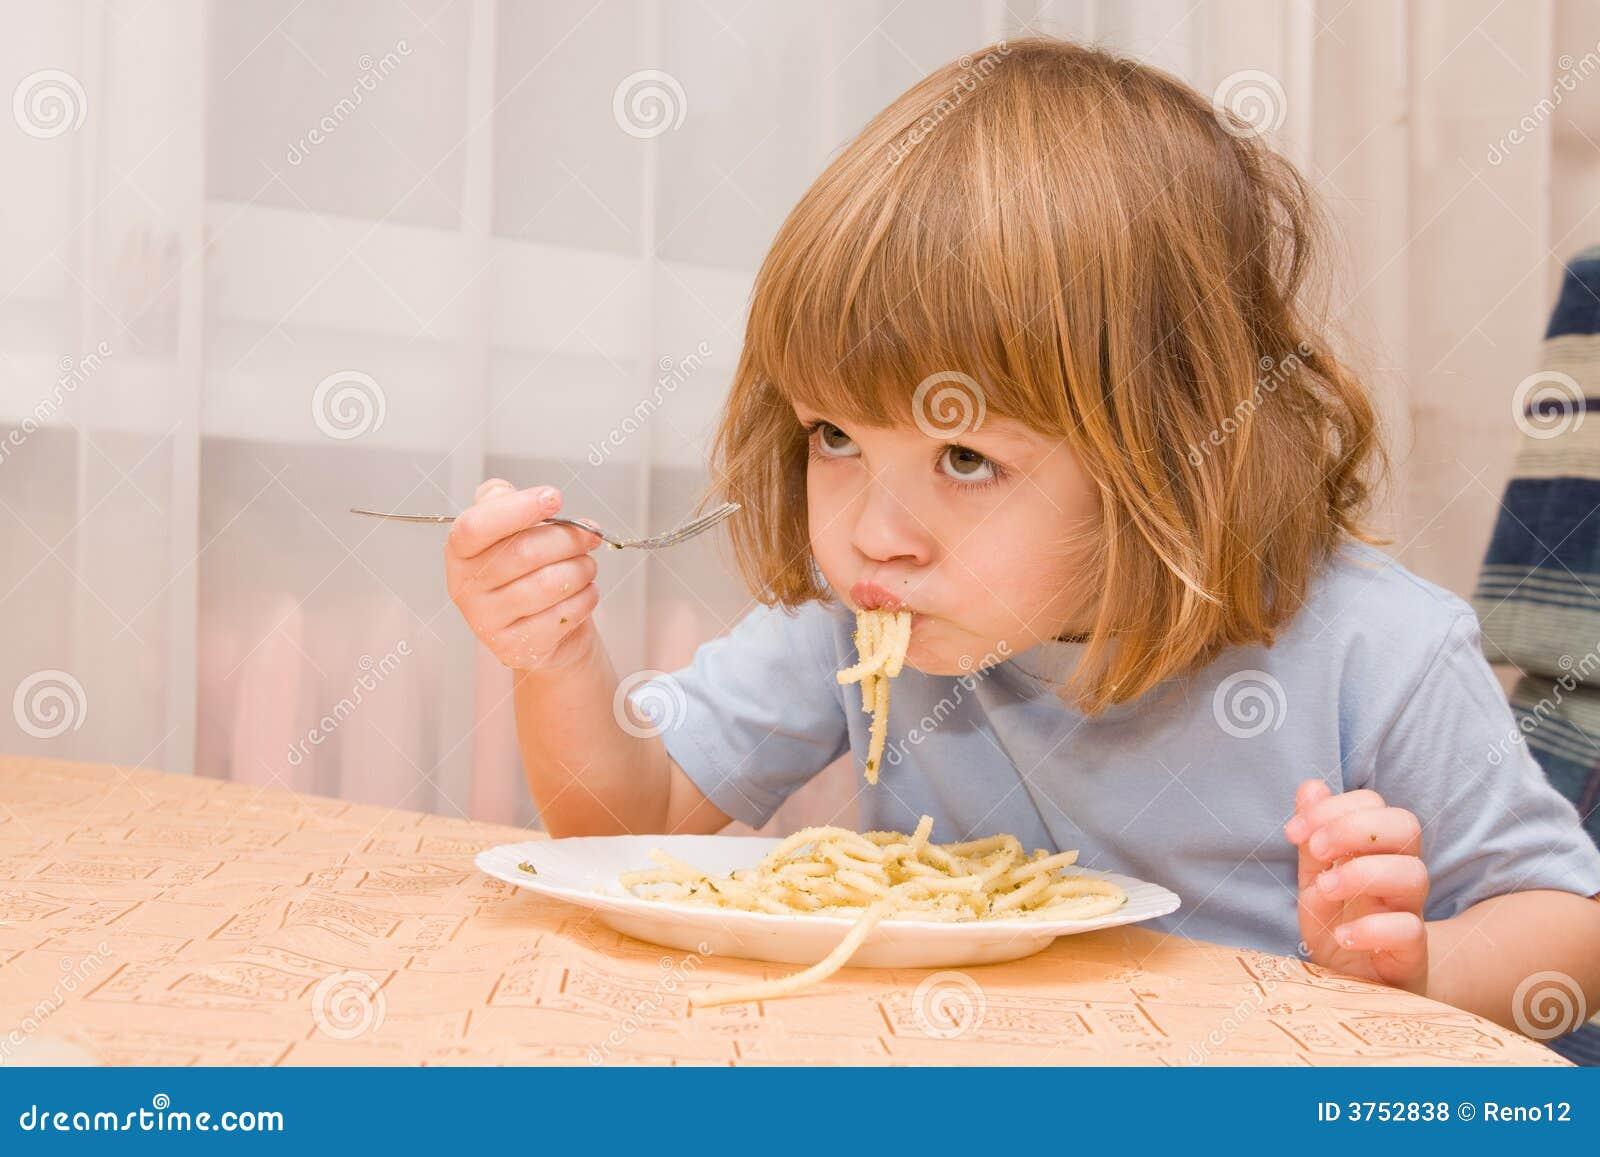 Kids love pasta